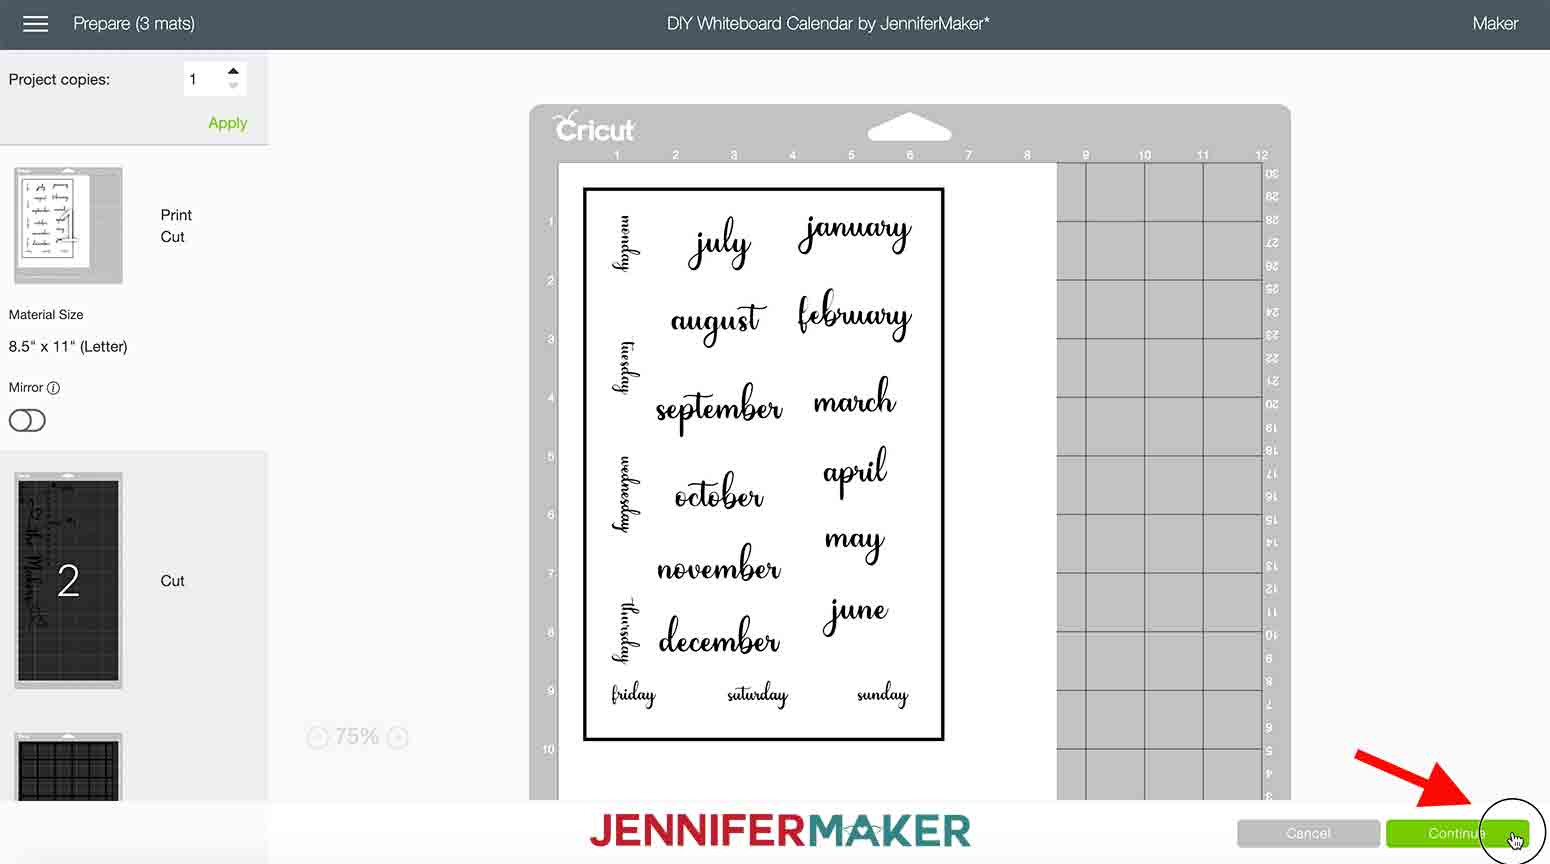 DIY-Whiteboard-Calendar-JenniferMaker-select-continue-print